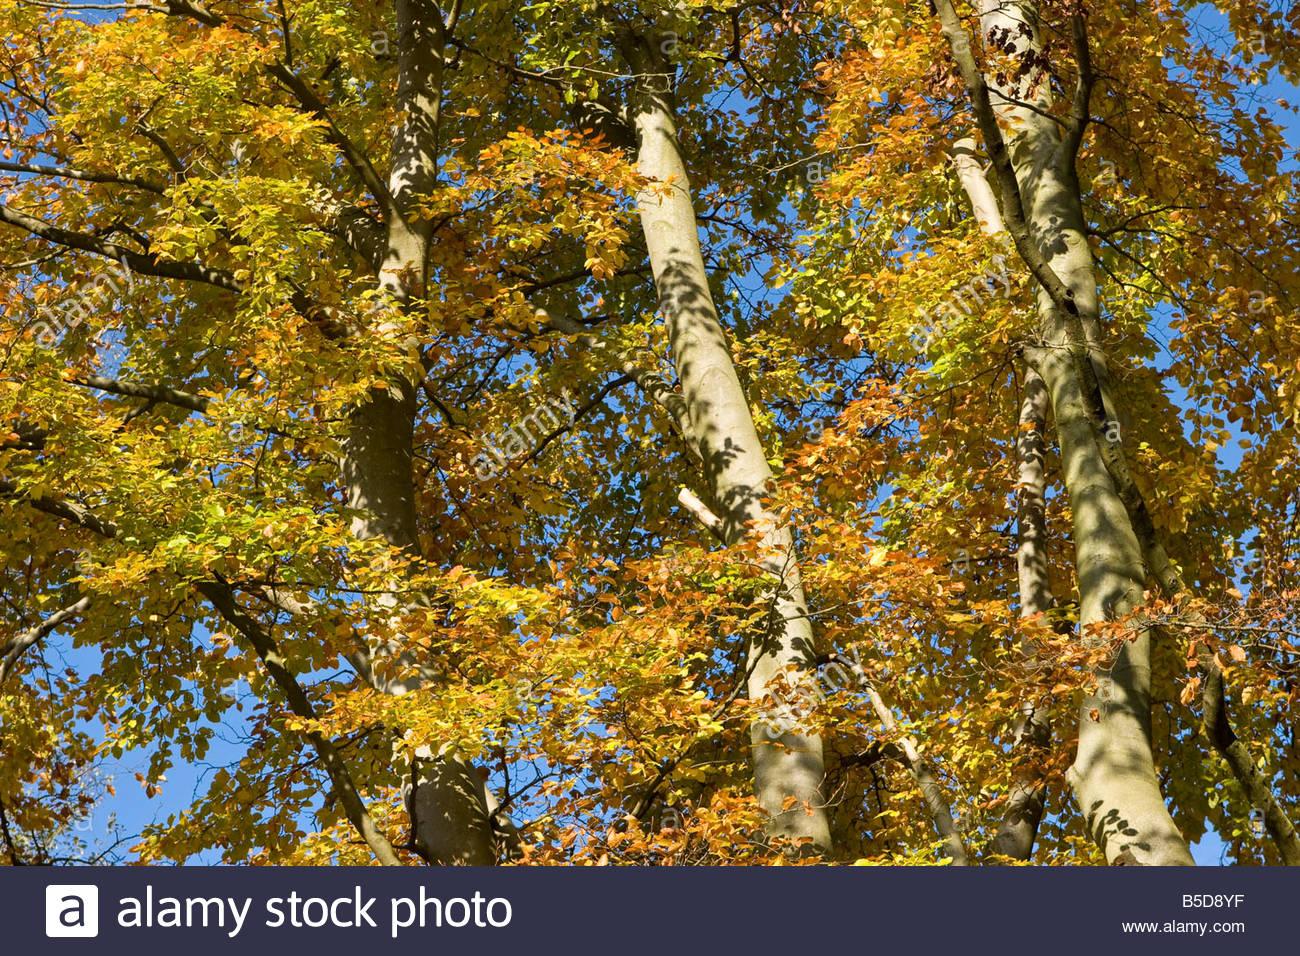 Birch trees in autumn, UK. - Stock Image